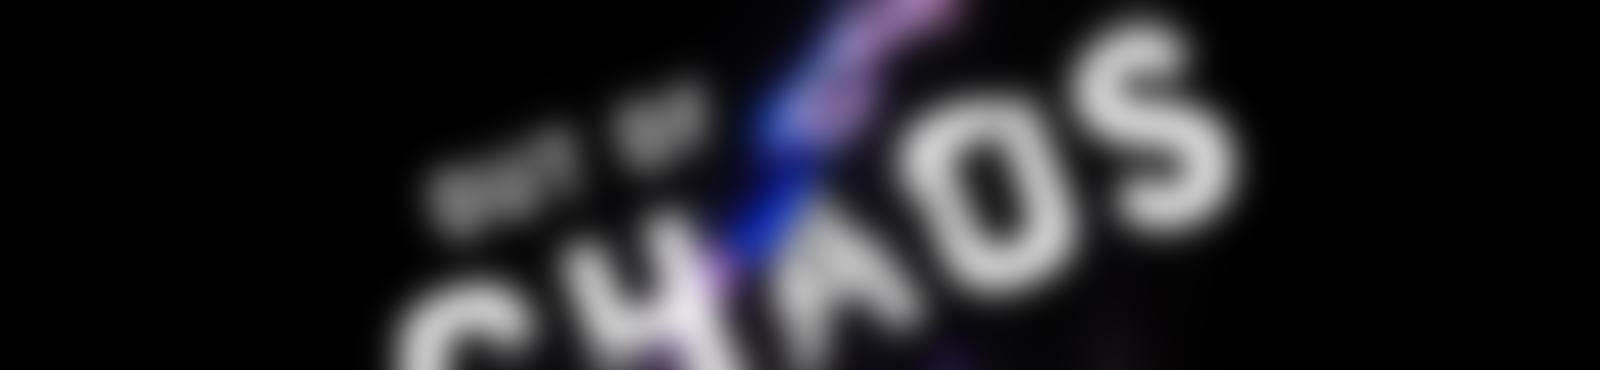 Blurred f78001f2 bcbd 4527 bbcd dbda1cc98c92